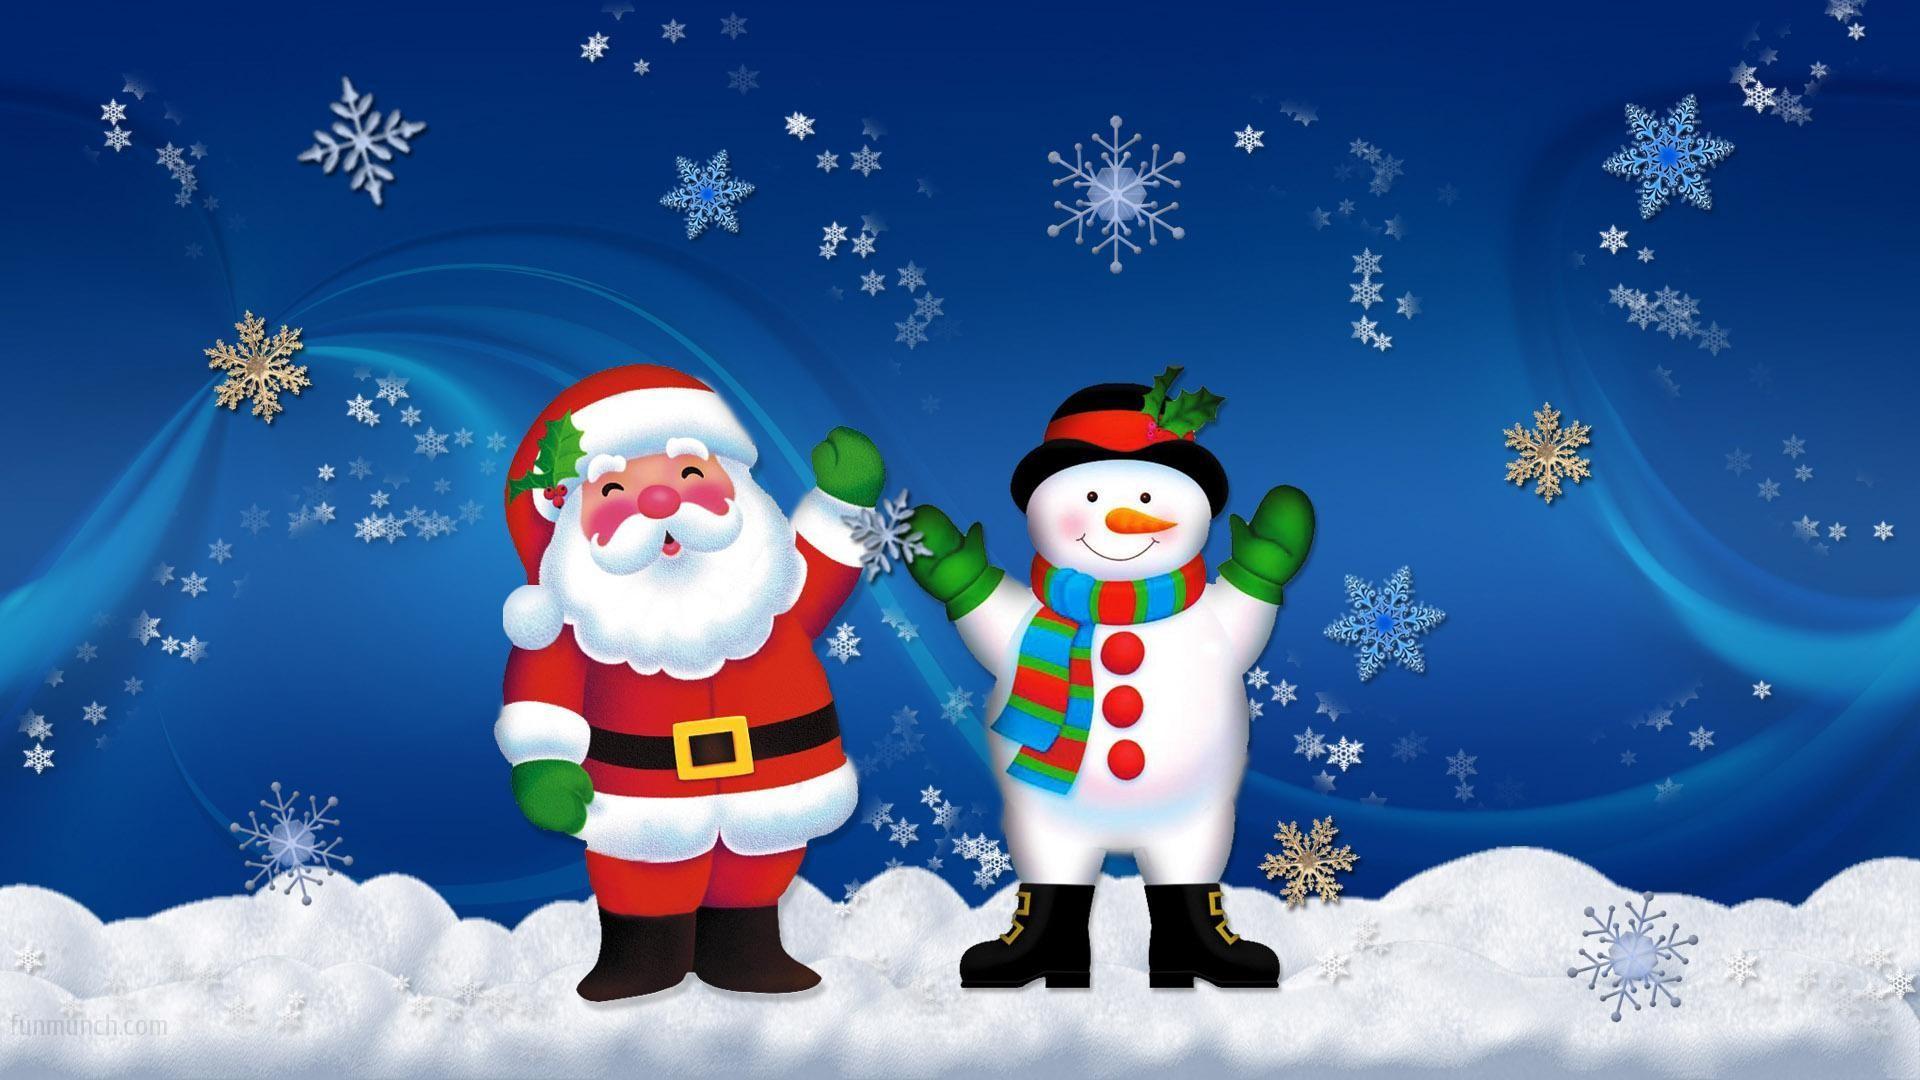 Animated Christmas Desktop Backgrounds, wallpaper, Animated Christmas .